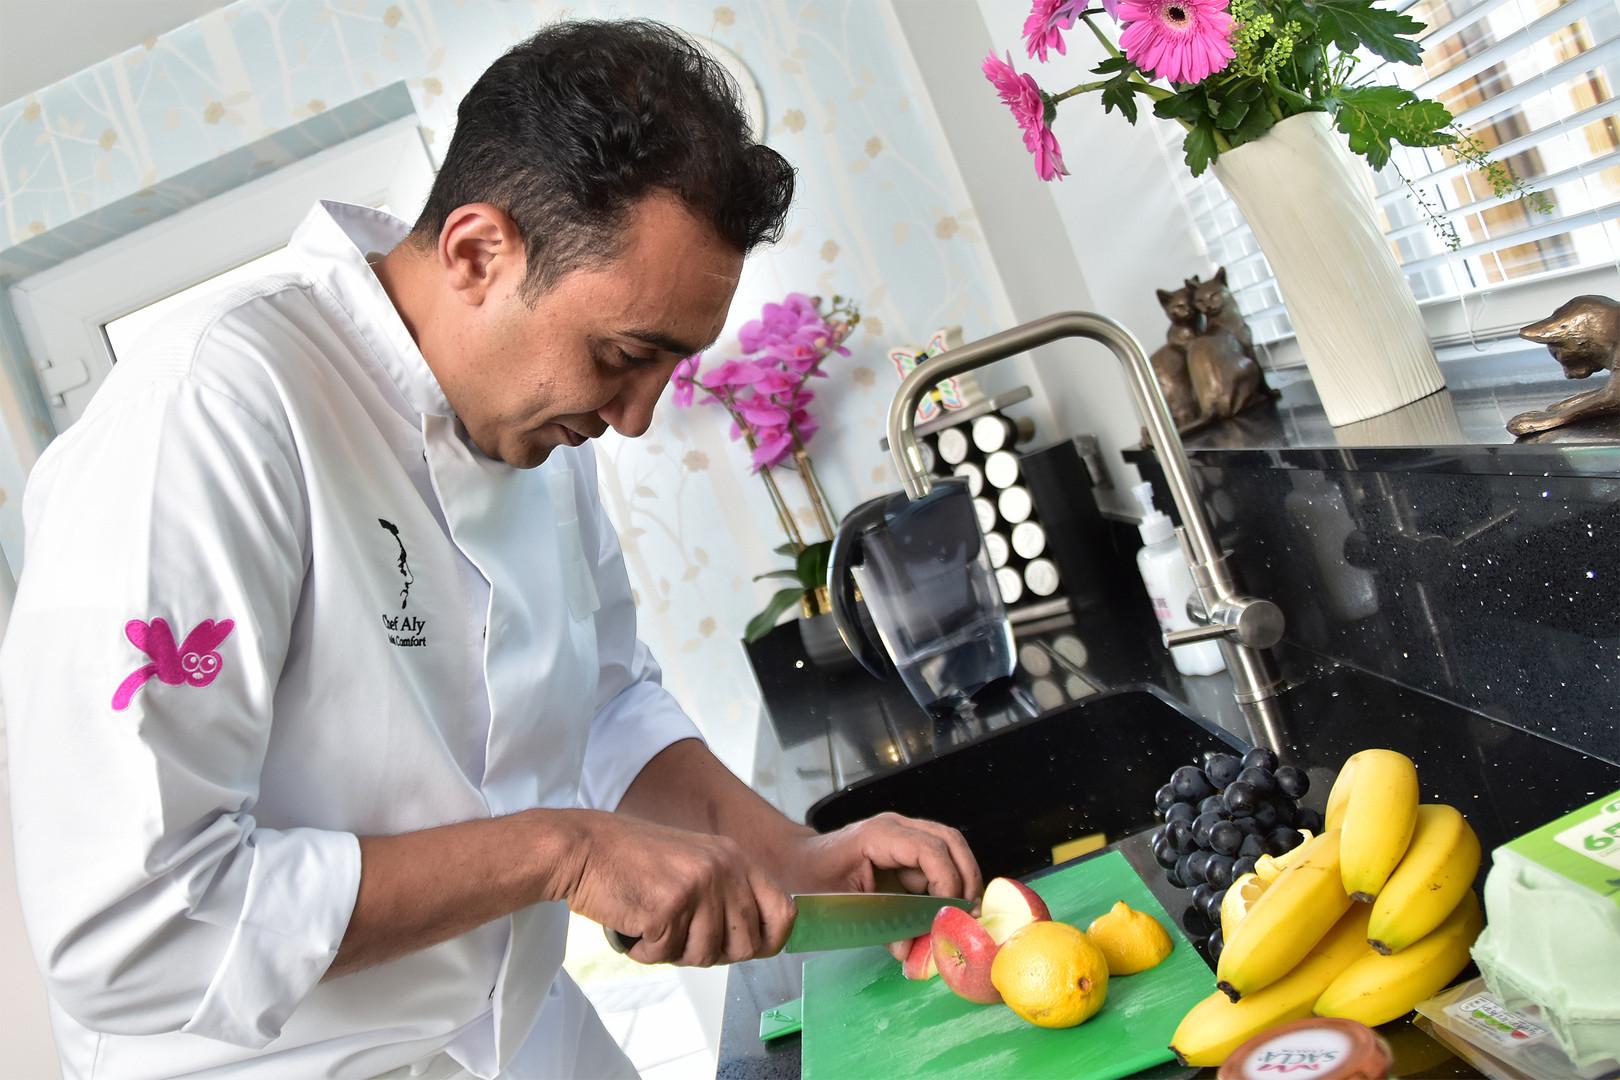 Chef Aly 008 .jpg